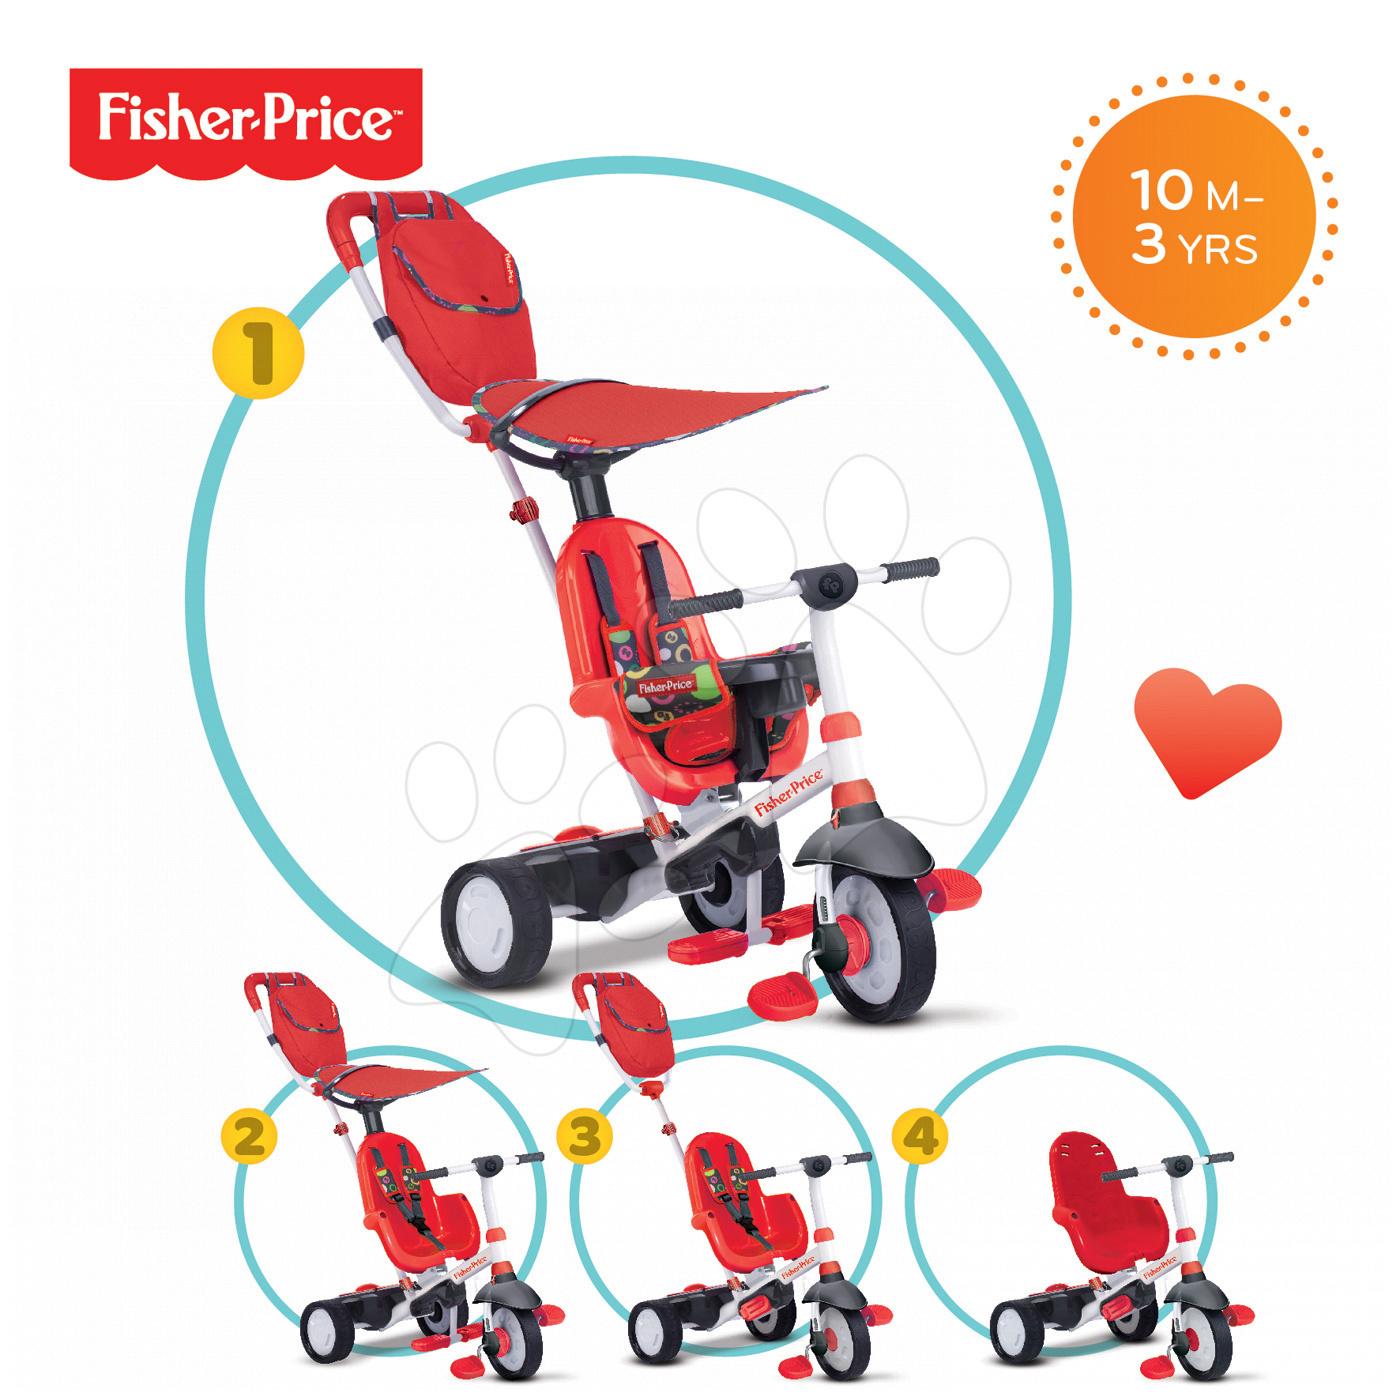 Trojkolky od 10 mesiacov - Trojkolka Fisher-Price Charisma Touch Steering smarTrike červená od 10 mes